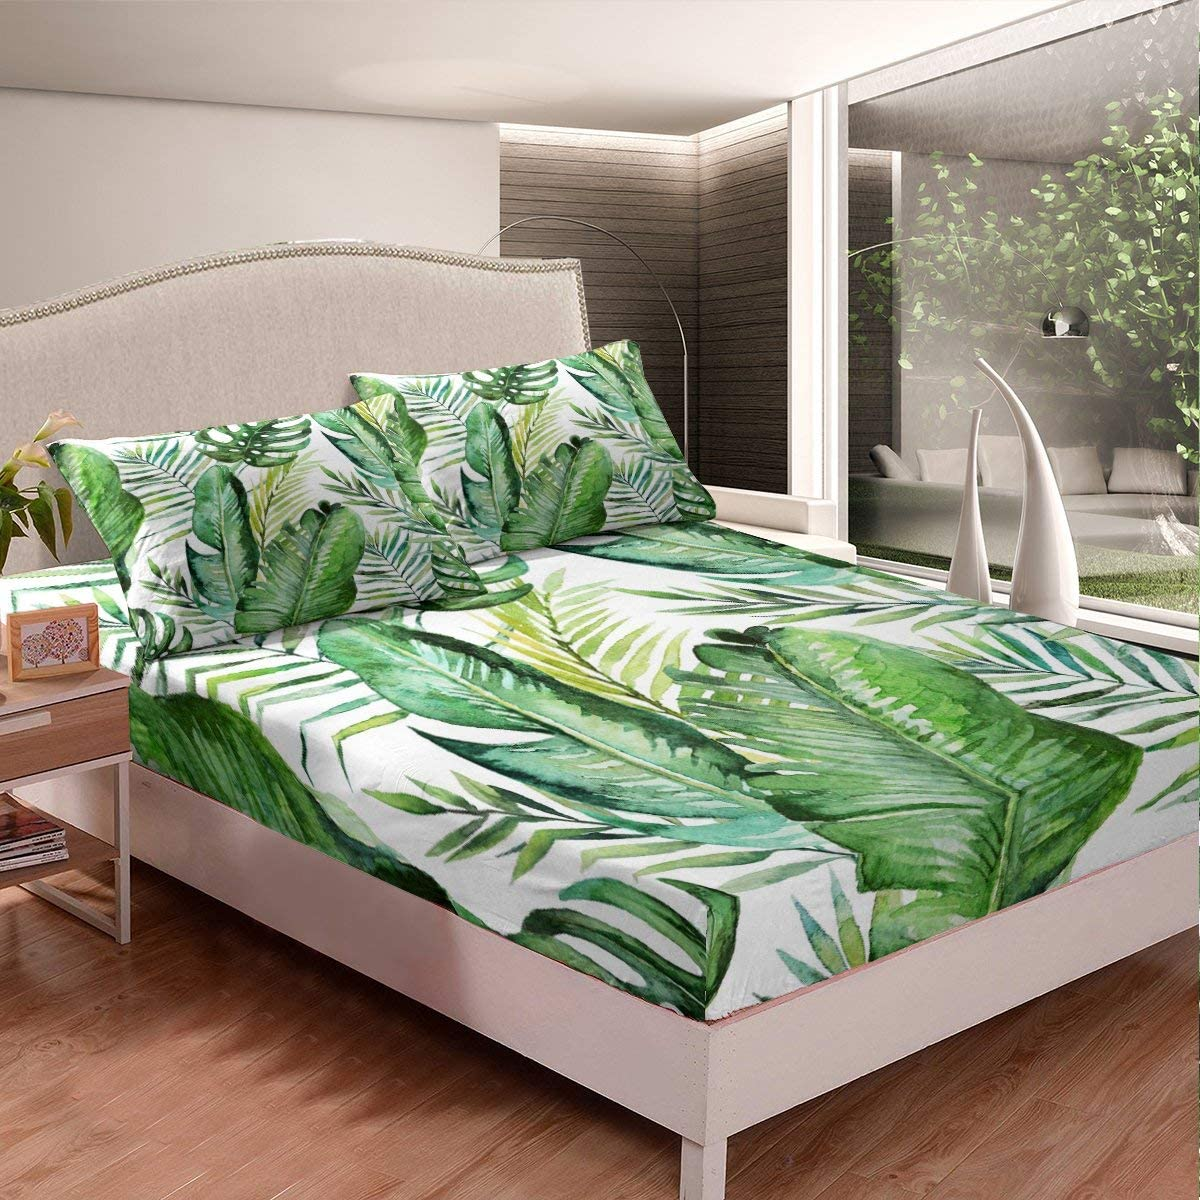 Blue White Room Dorm Decorative Erosebridal Ocean Beach Fitted Sheet Twin Size Palm Trees Bed Sheet Set Coastal Nature Theme Bed Cover for Kids Boys Girls Teens Hawaiian Bedding Set